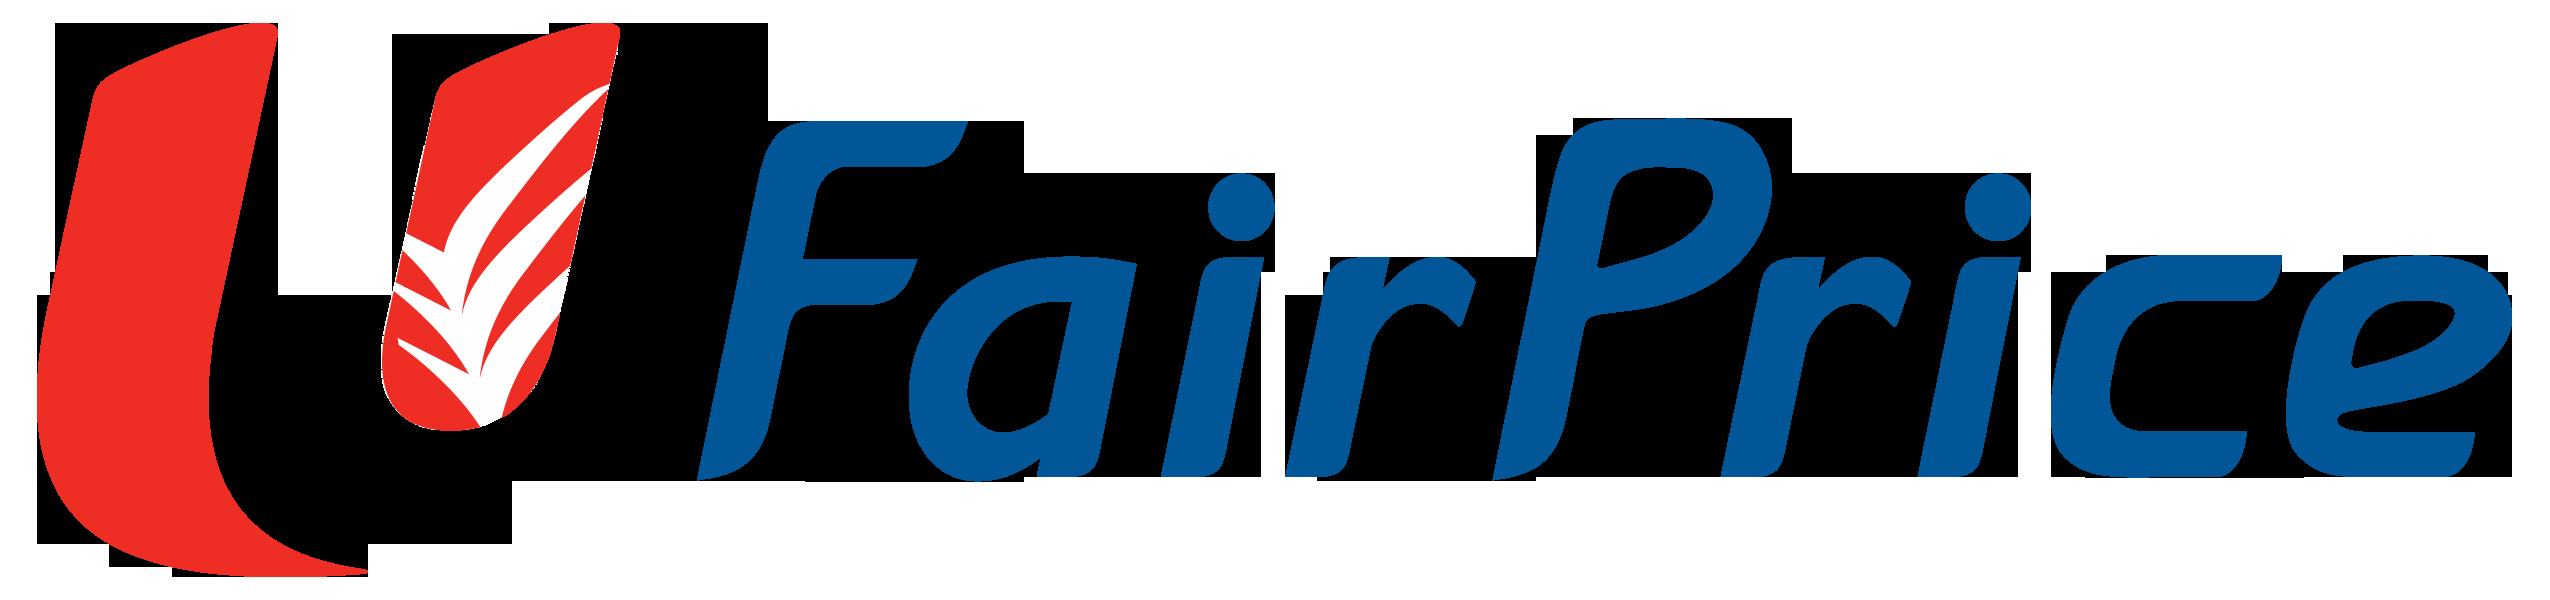 Fairprice Logo PNG - 29274